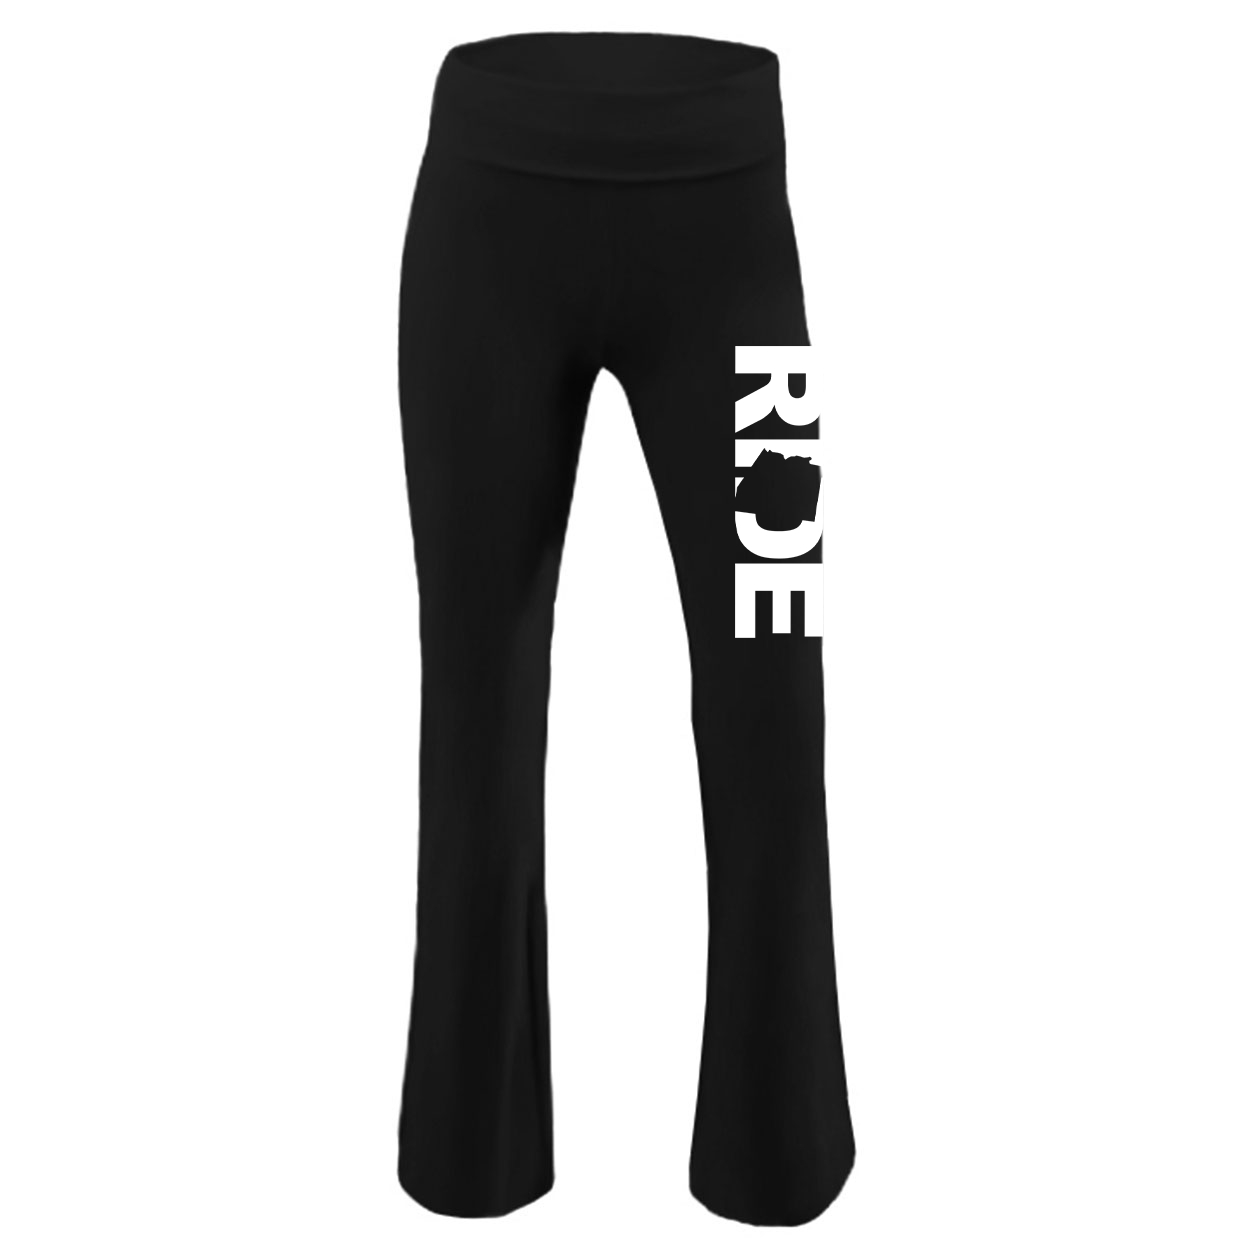 Ride Arizona Classic Youth Girls Yoga Pants Black (White Logo)